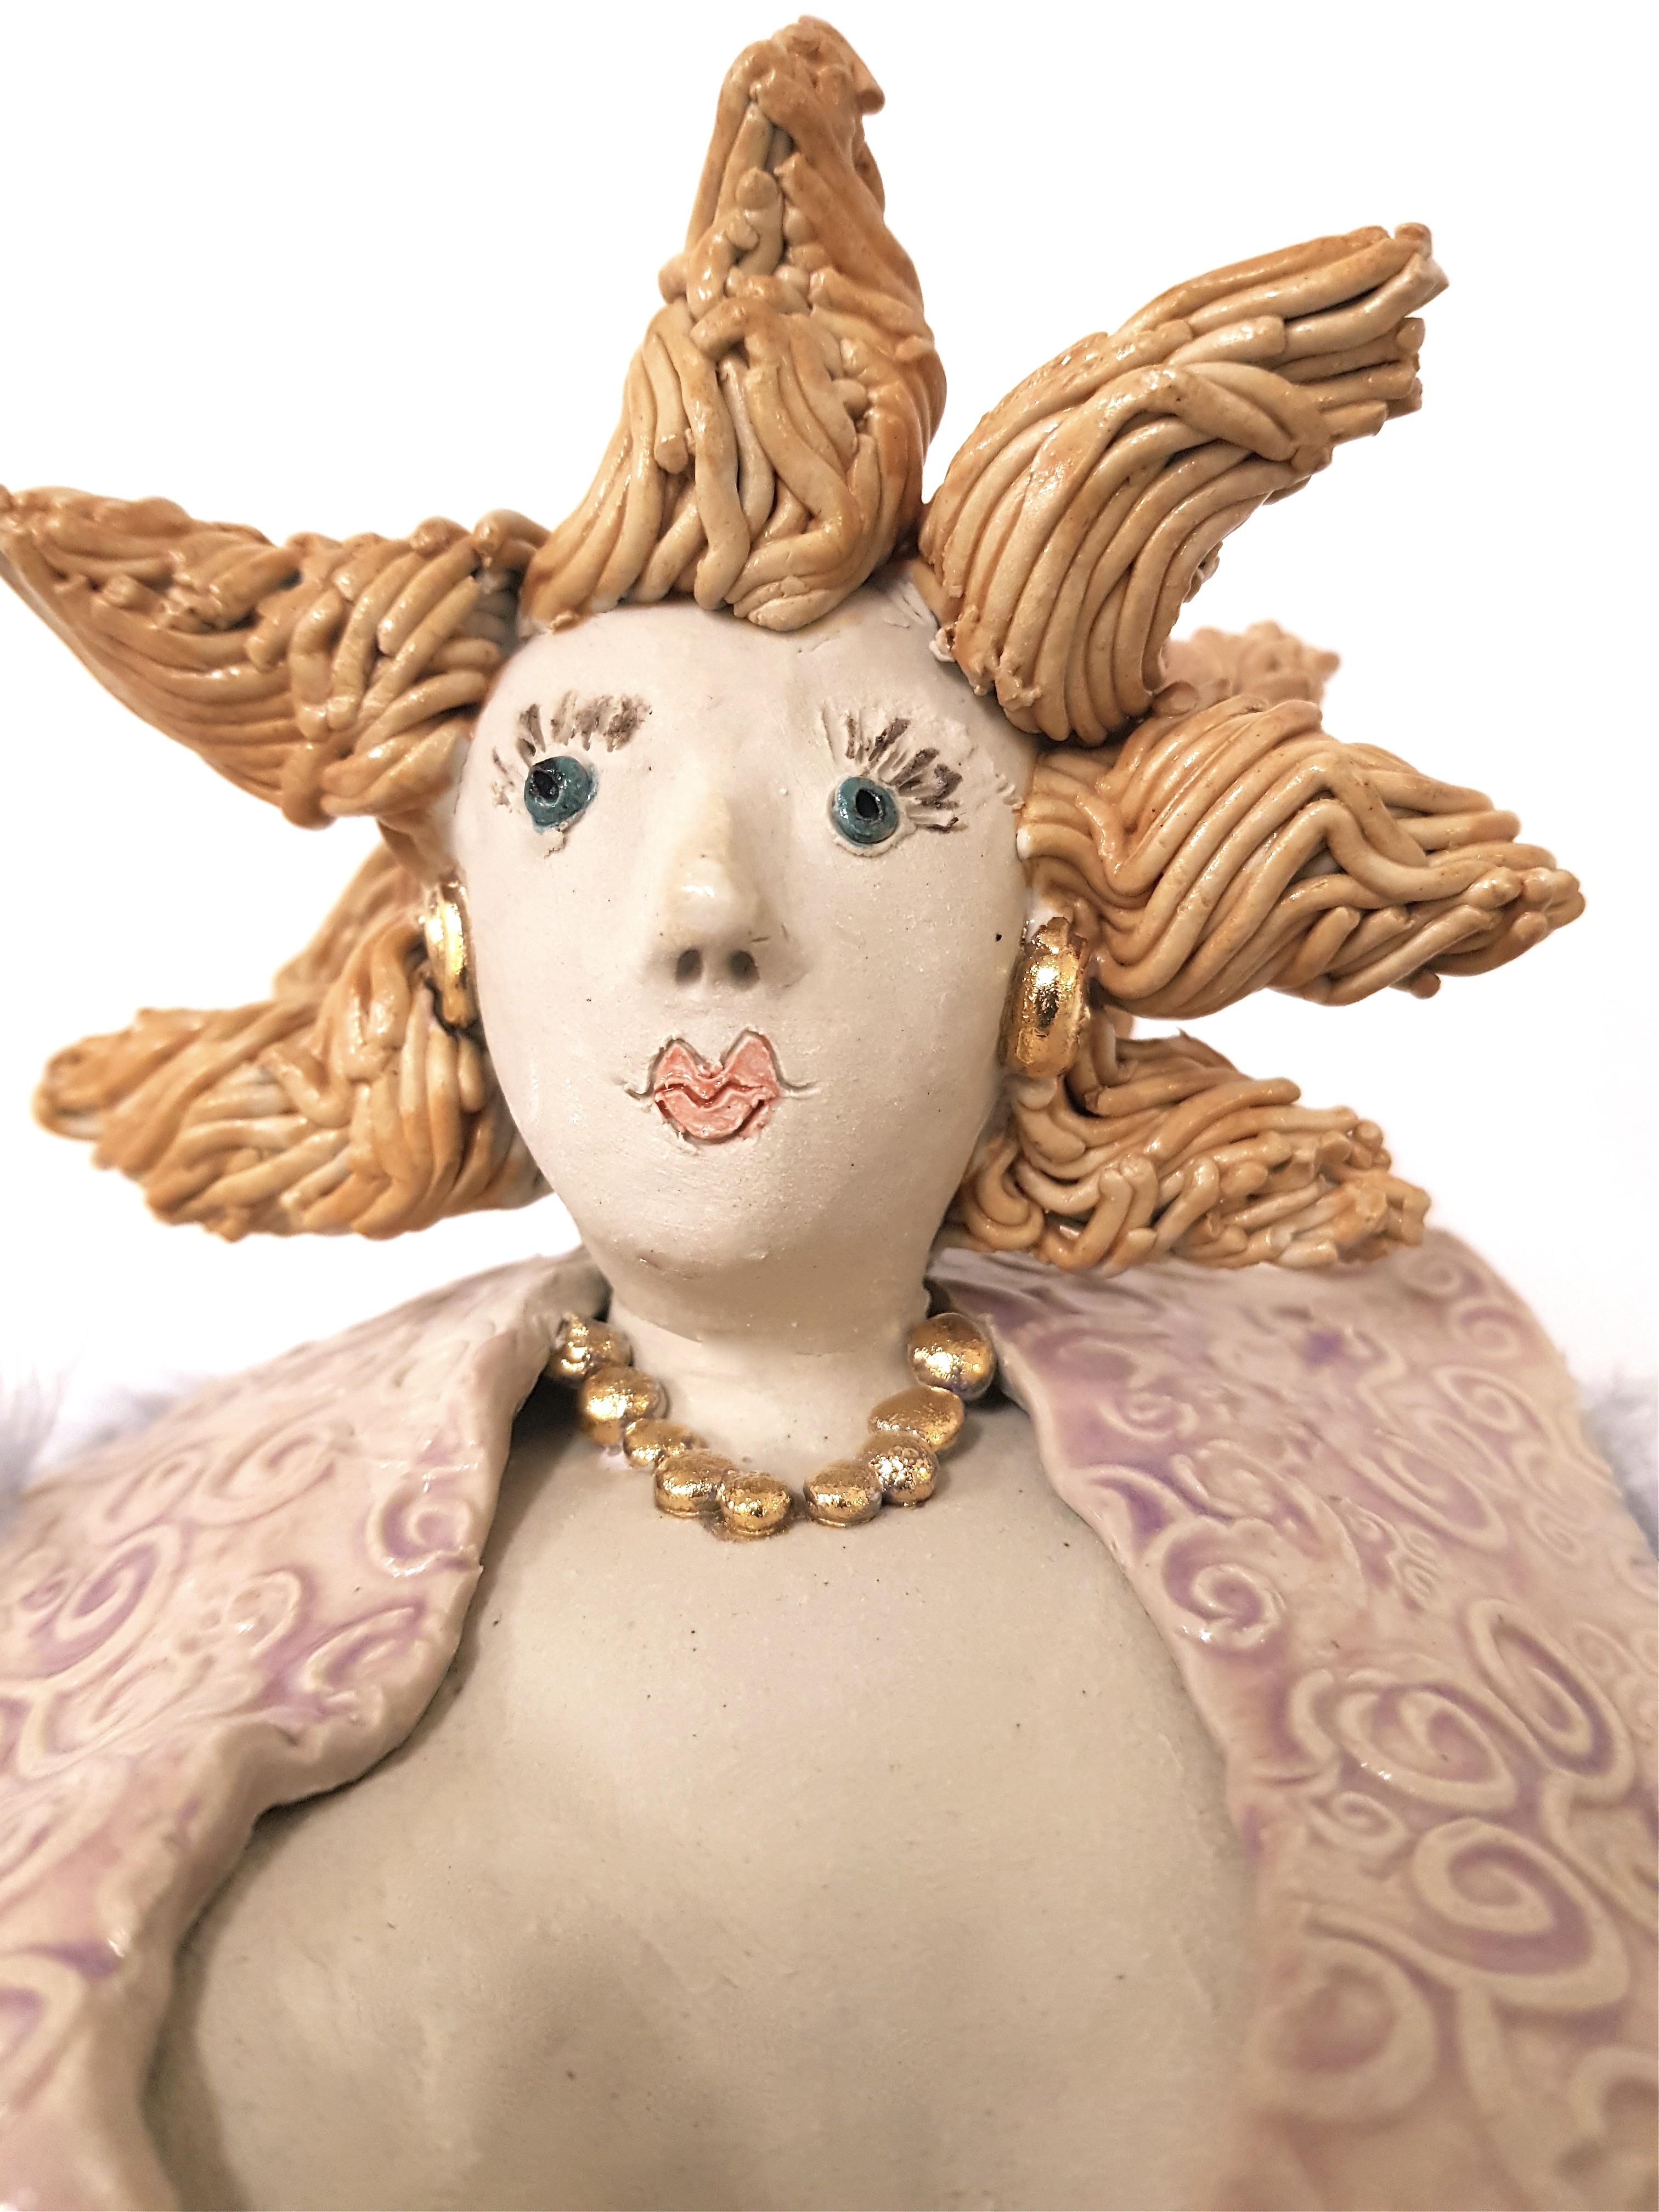 Diva ROSALINDE, Unikat, Keramik, Töpferei la ceramica Basel, Töpferkurse, Teamevents, Shop